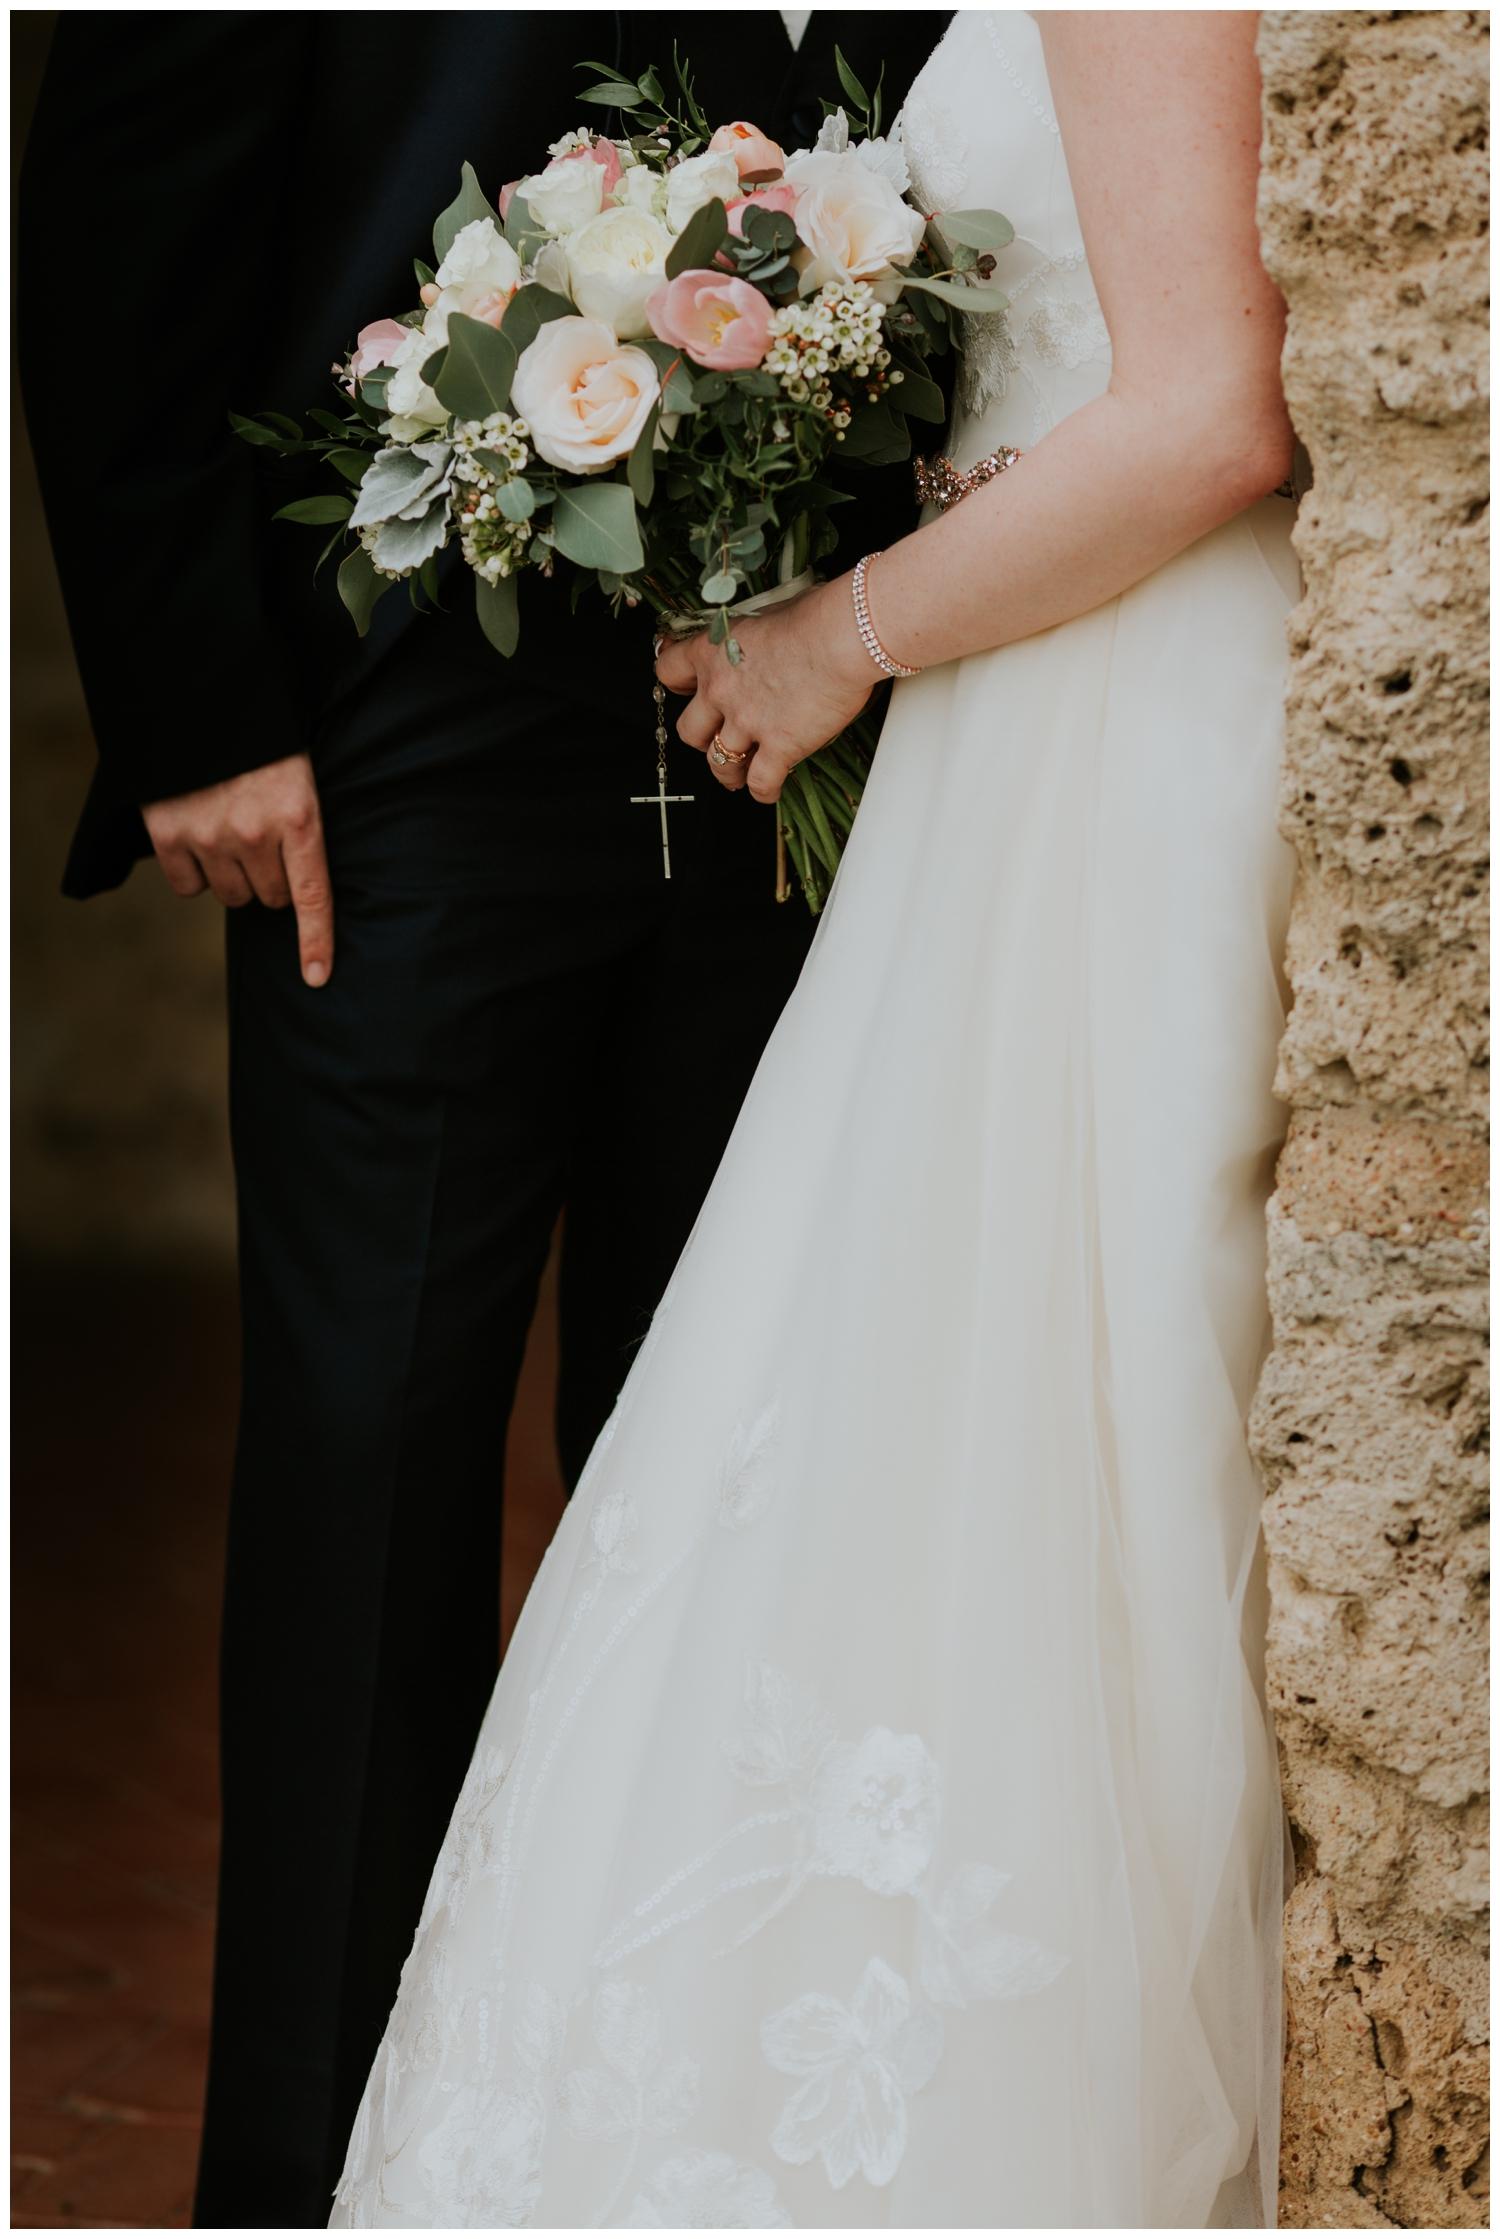 Jenna+Brandon, Mission Concepcion Wedding, San Antonio, Contista Productions Wedding Photography_0077.jpg